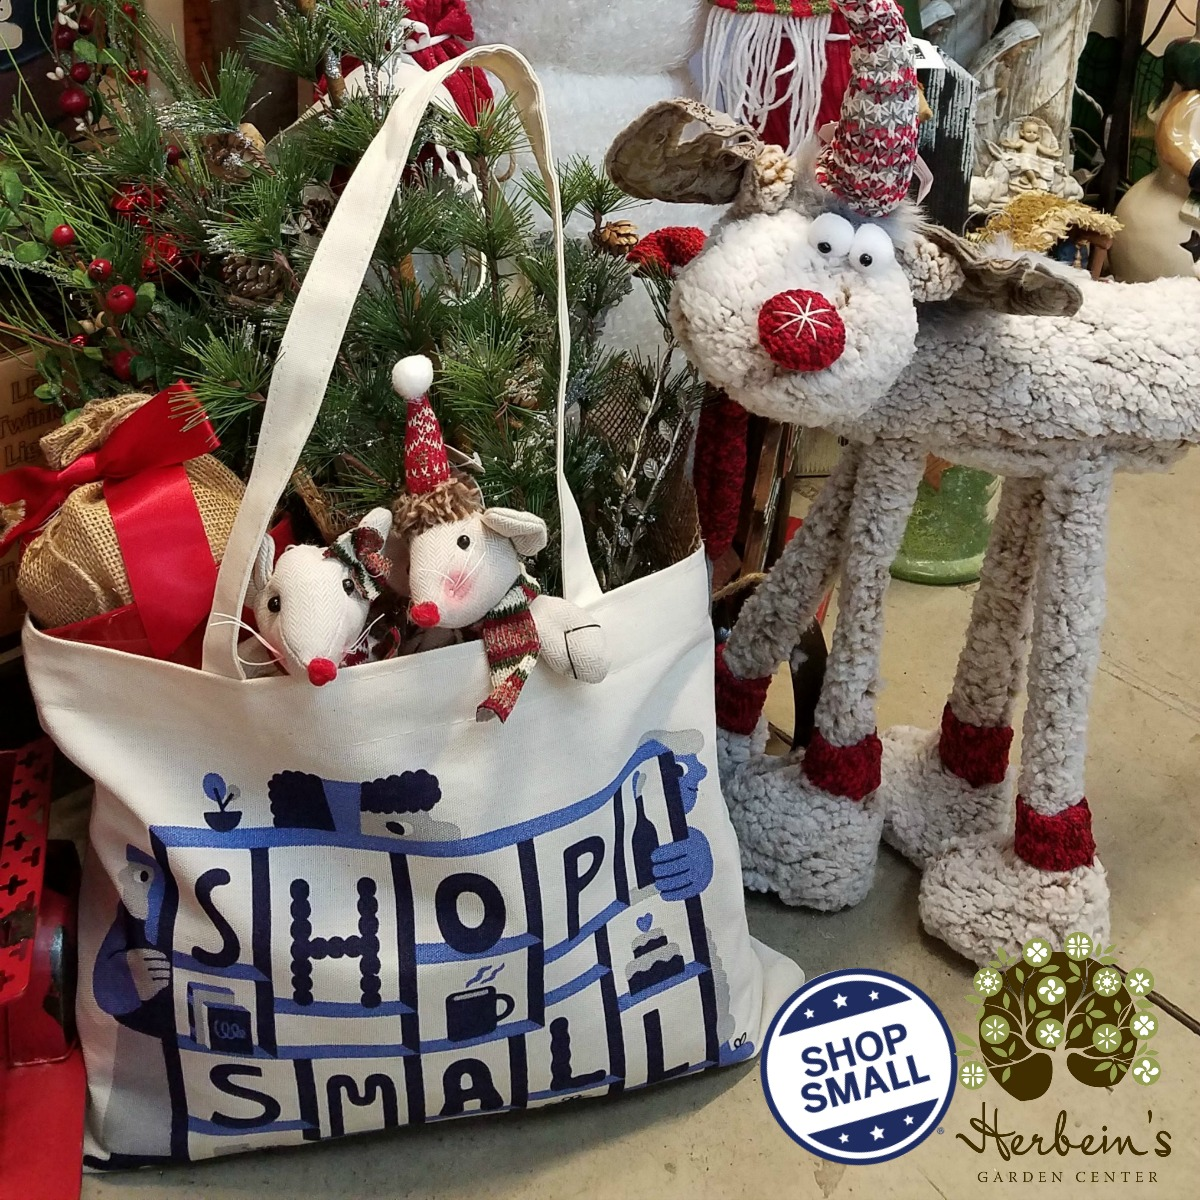 Small Business Saturday Herbeins Garden Center Christmas